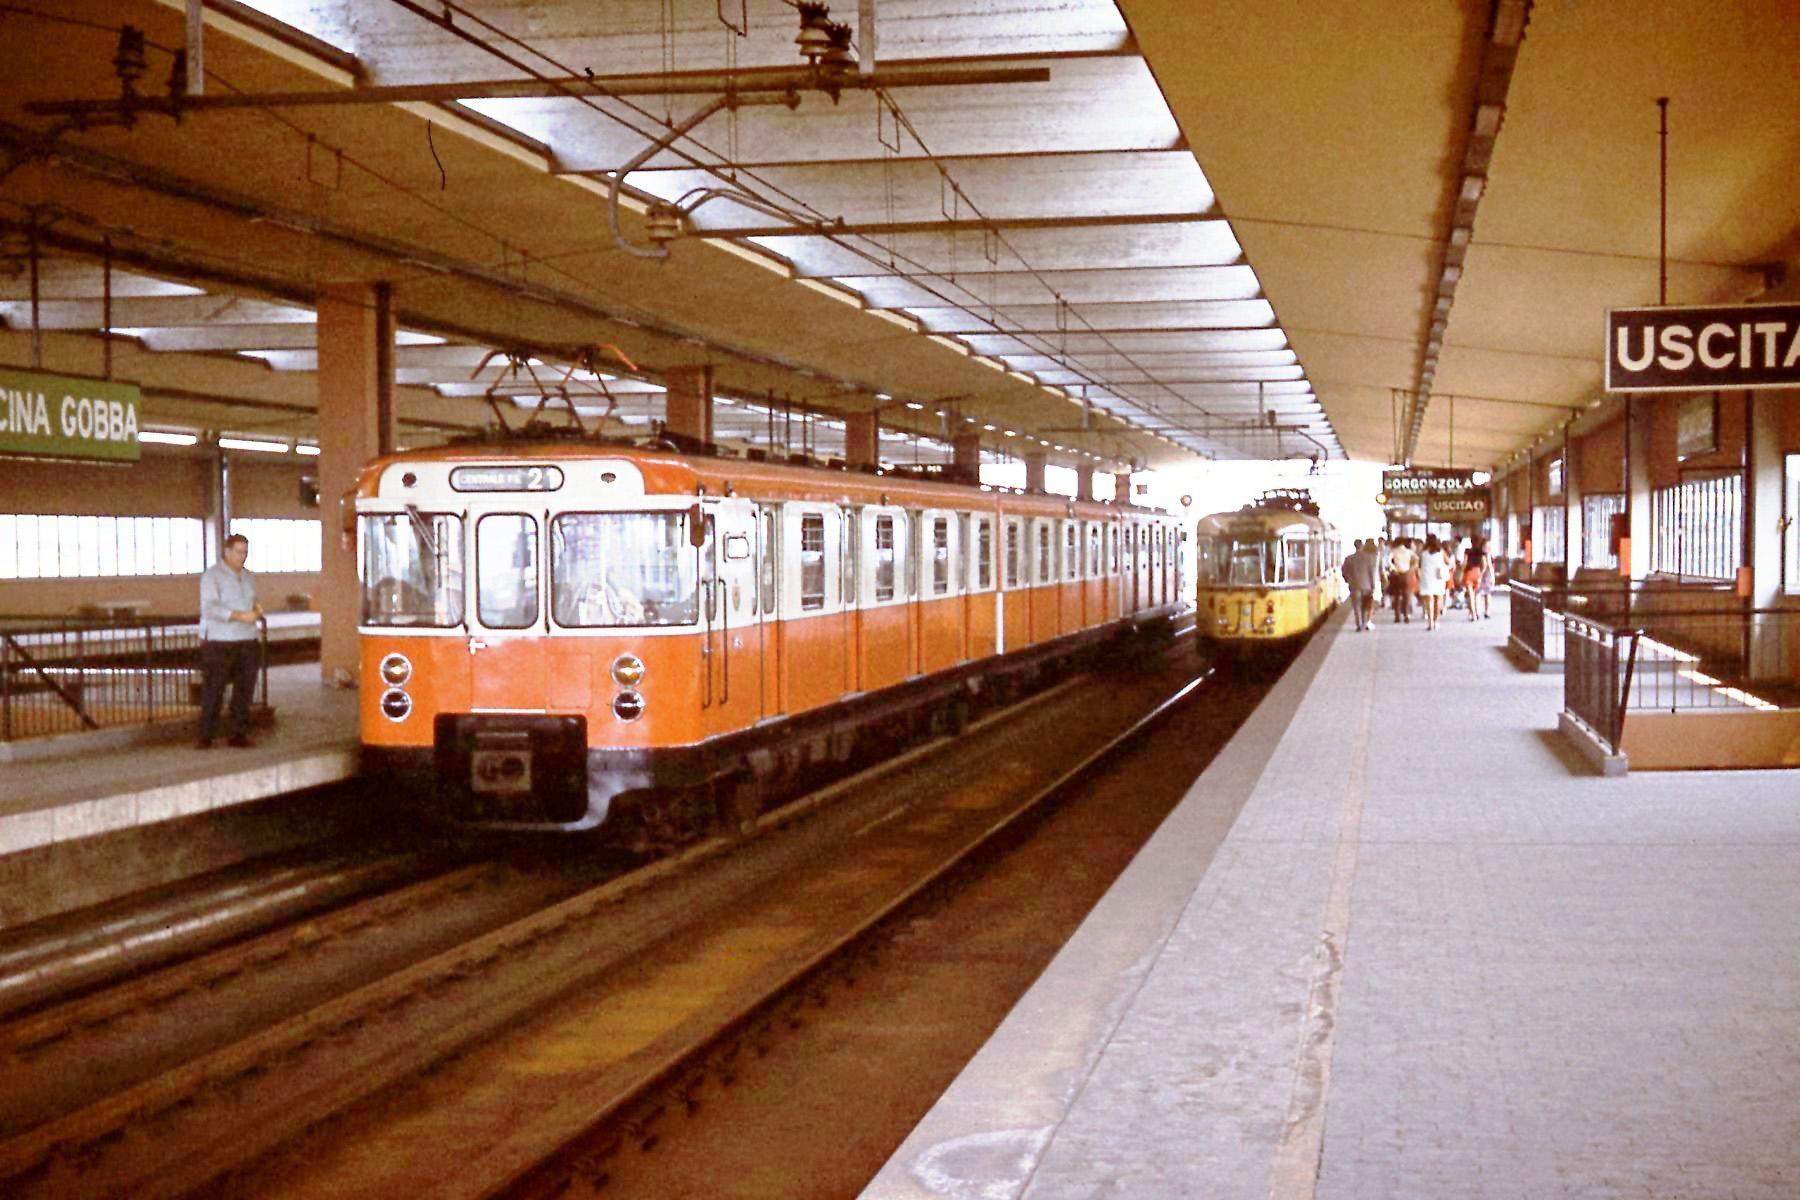 Cascina Gobba Milan Metro Wikipedia